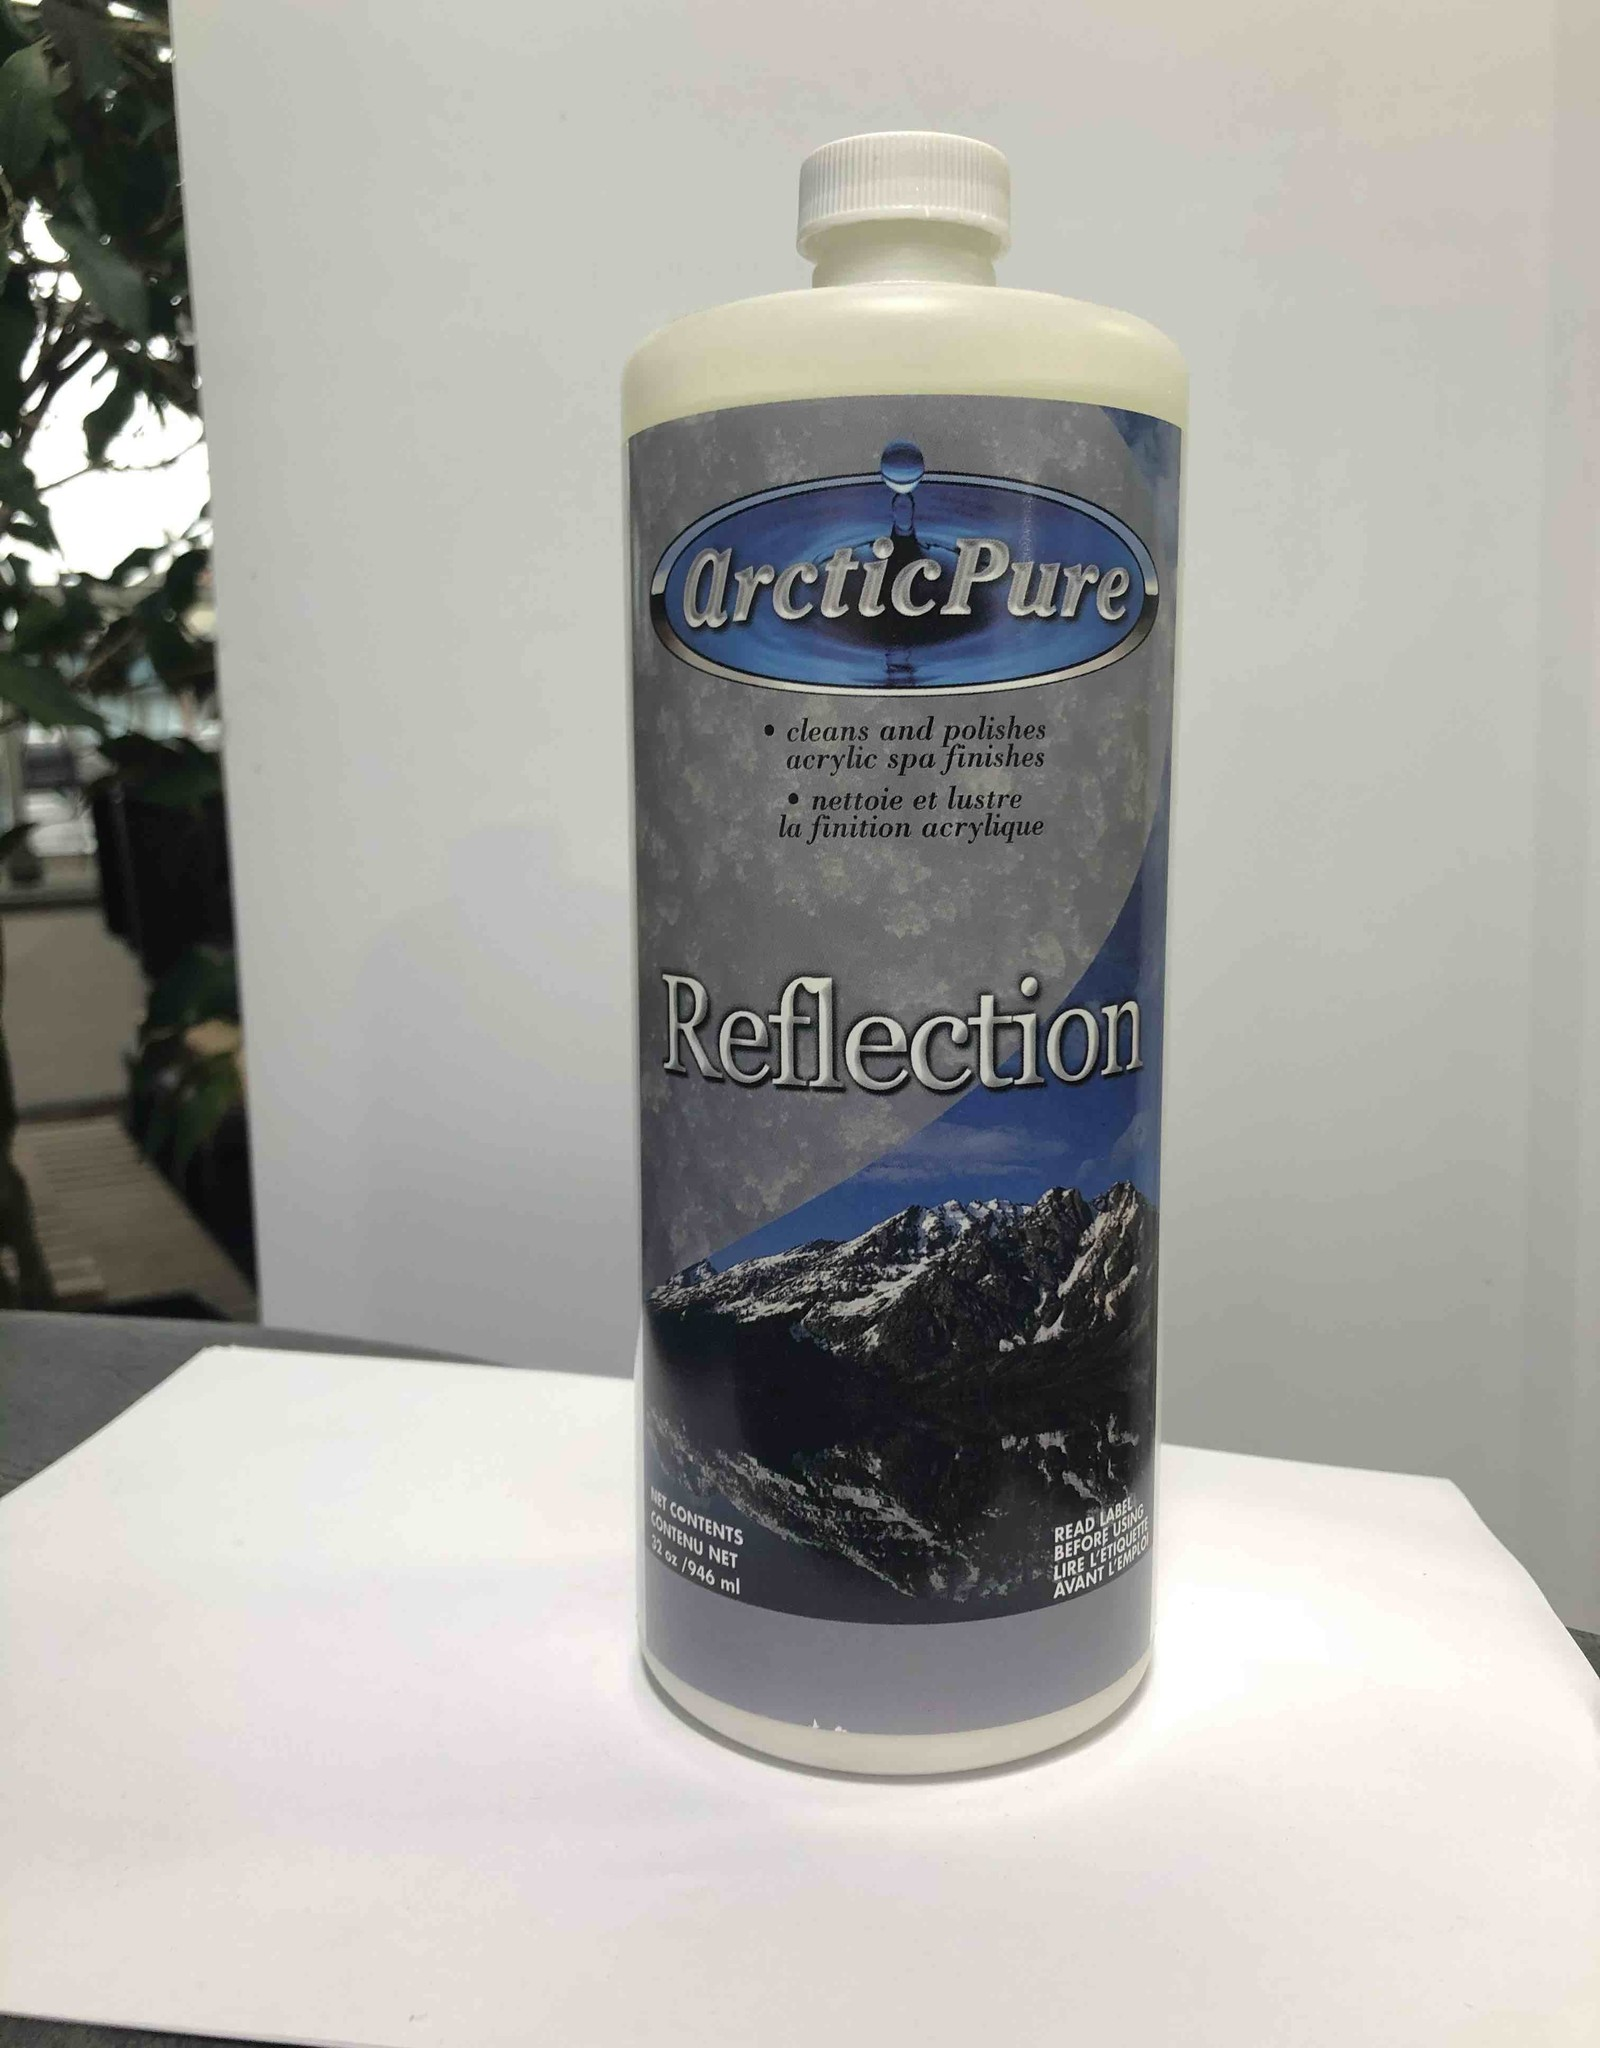 Capo Arctic Pure Reflection 946ml